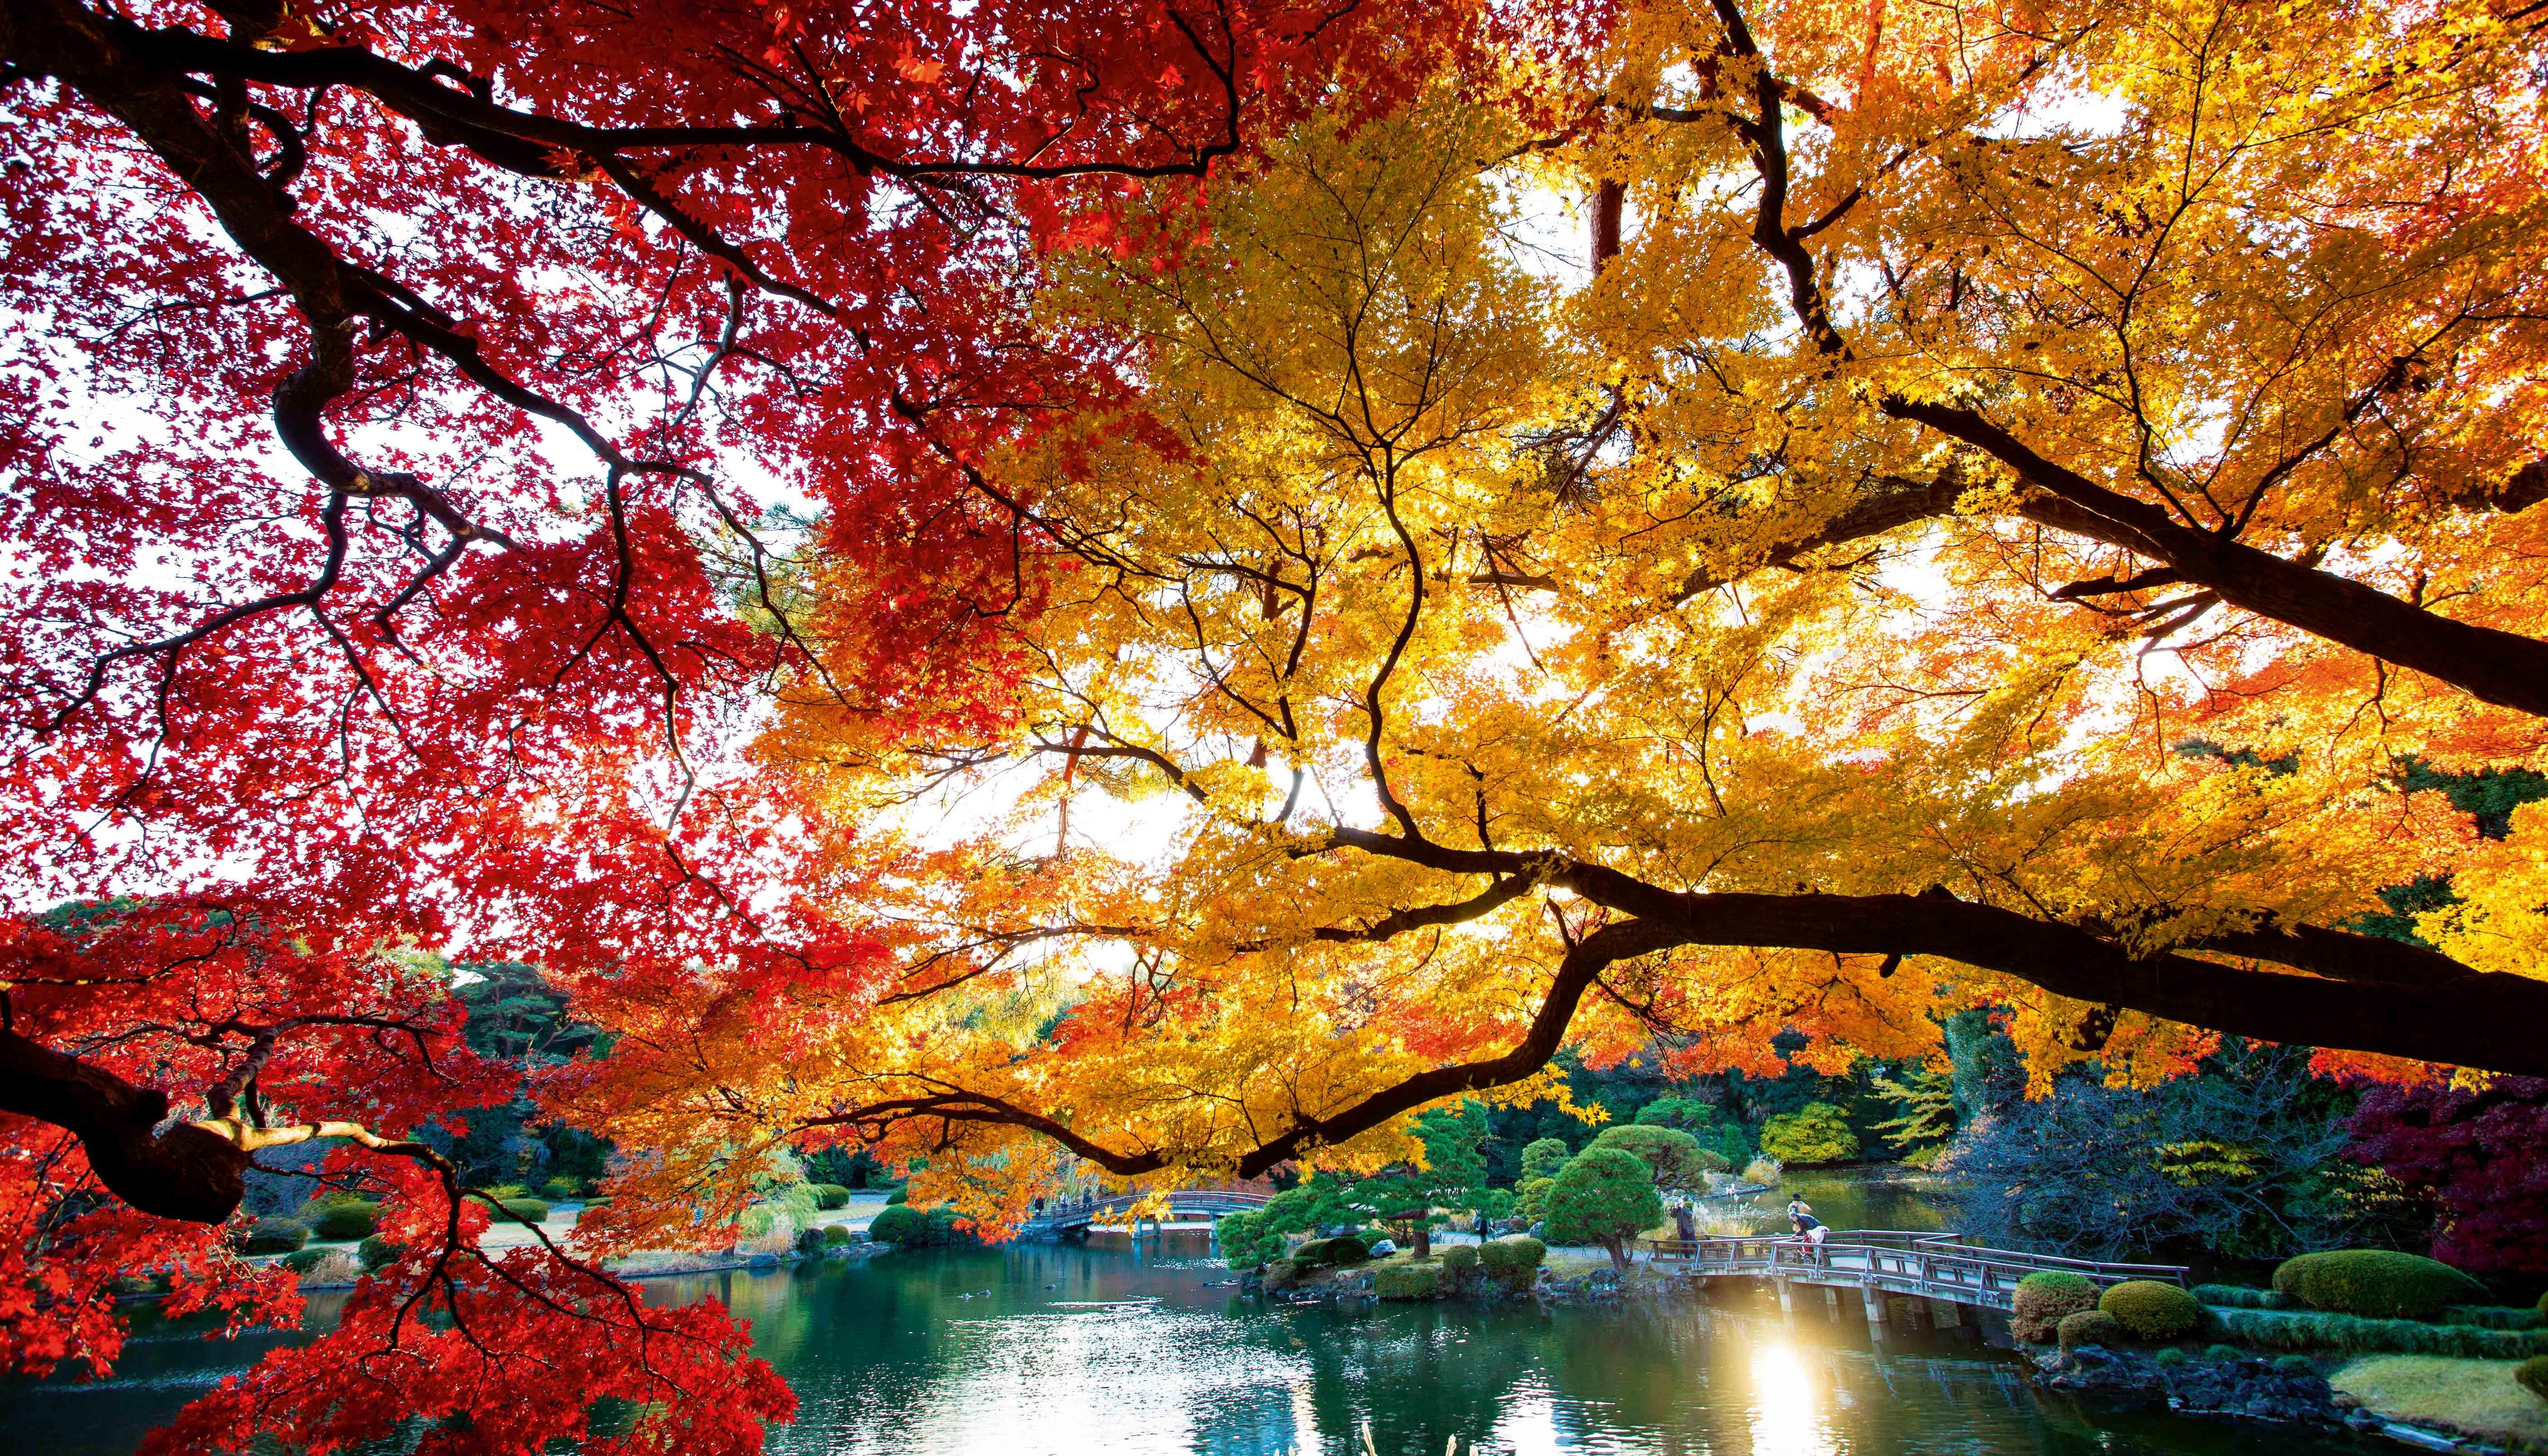 paysage japon - Recherche Google | Paysage automnal, Paysage, Paysage automne